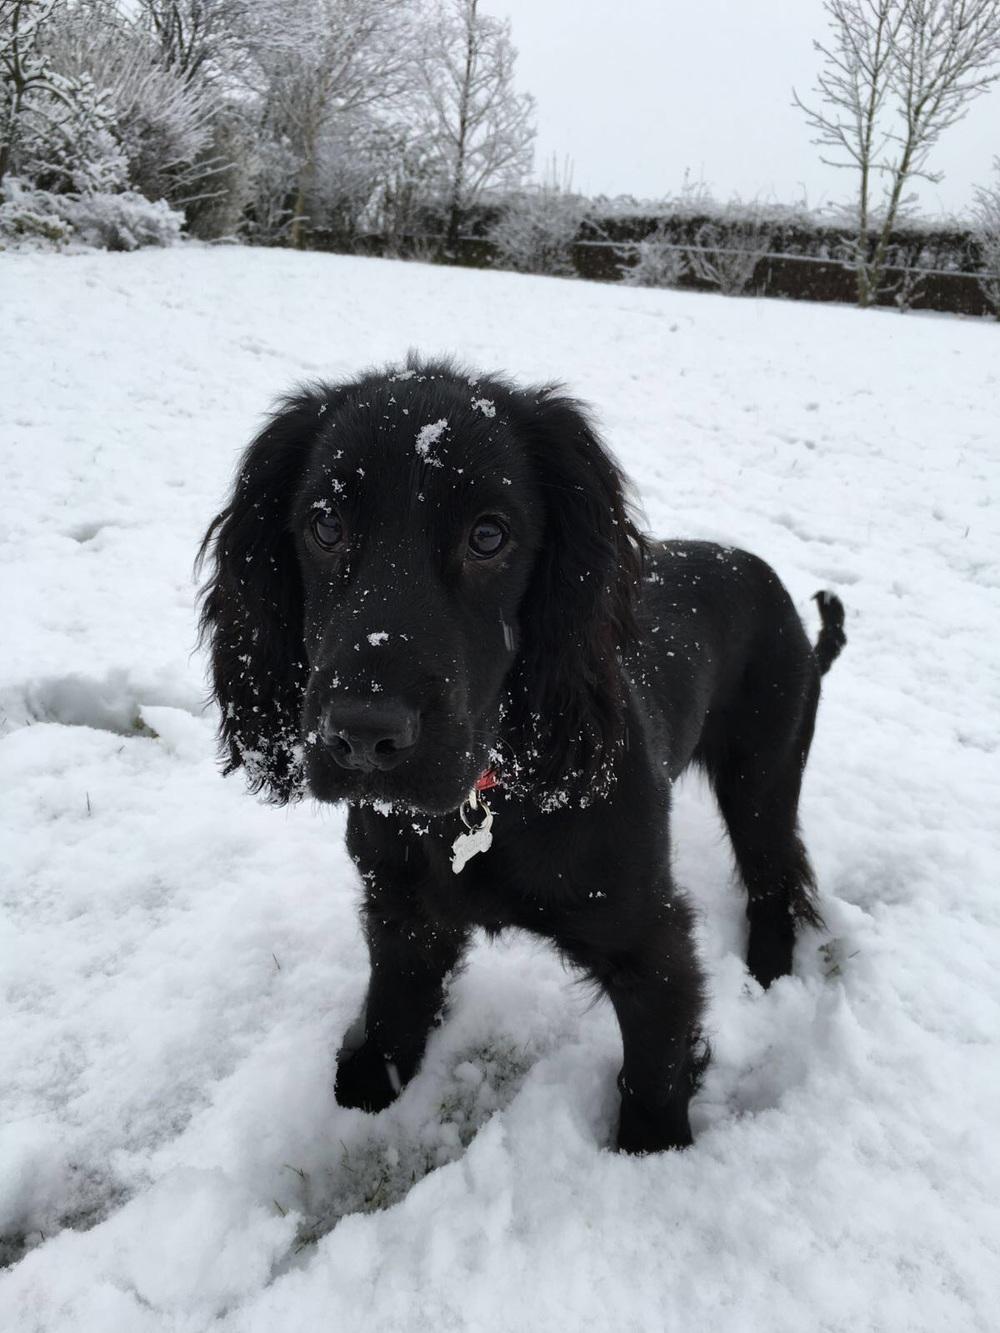 Snowy beast!